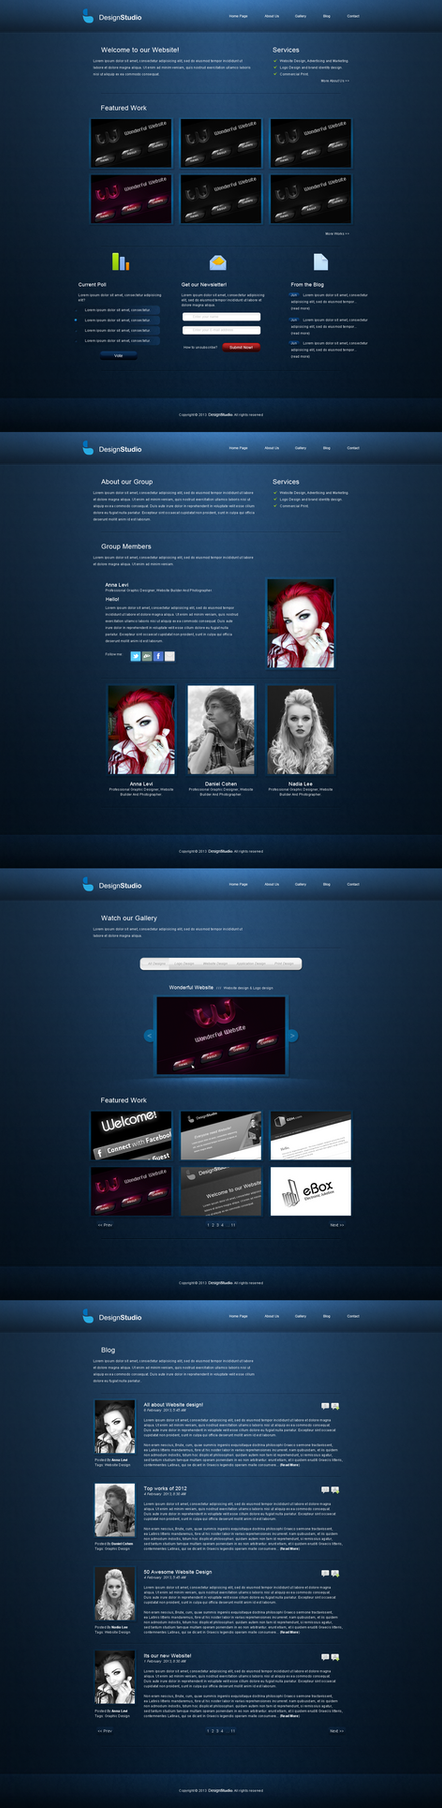 DesignStudio Website by RaymondGD